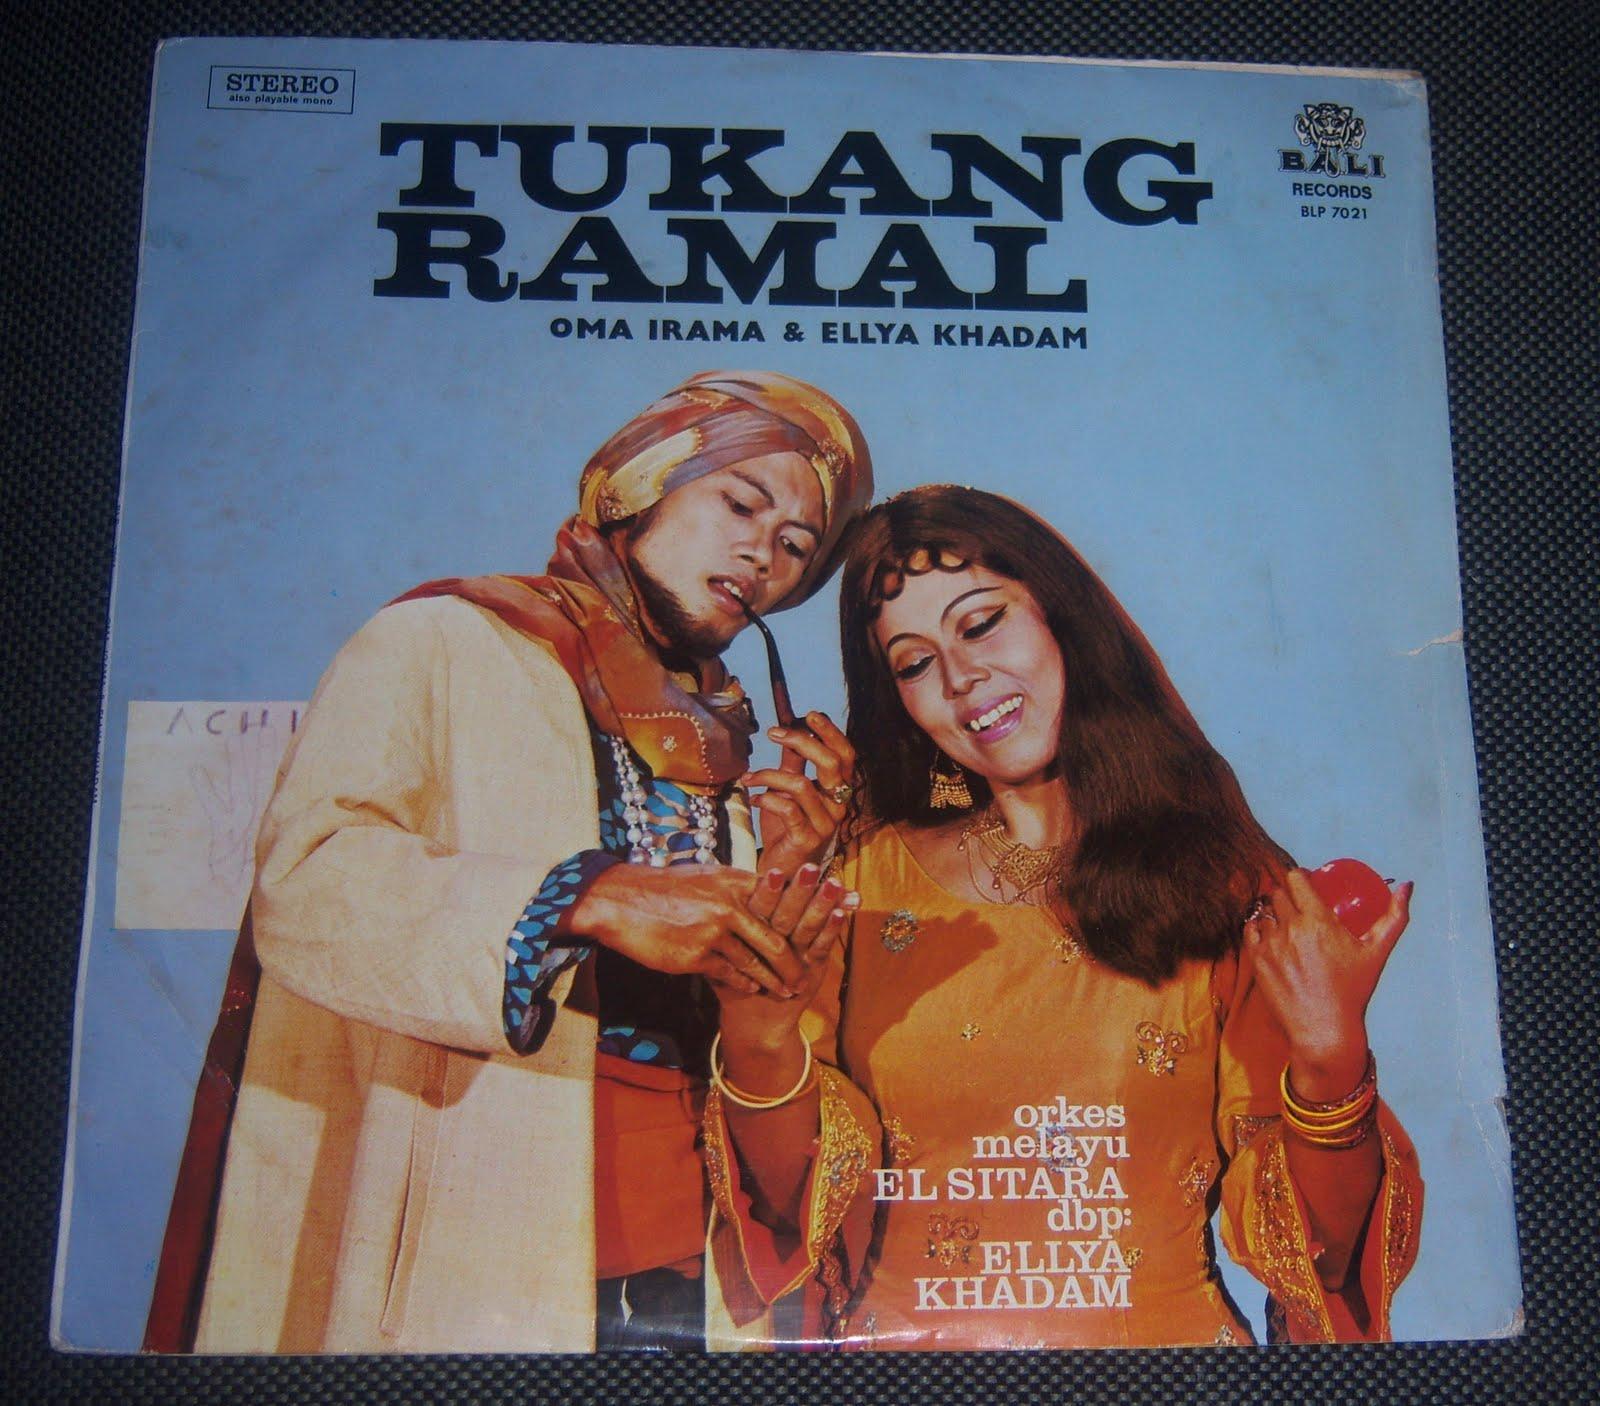 Download Lagu Atouna El: Lirik Lagu Tukang Ramal Rhoma Irama & Elya Khadam